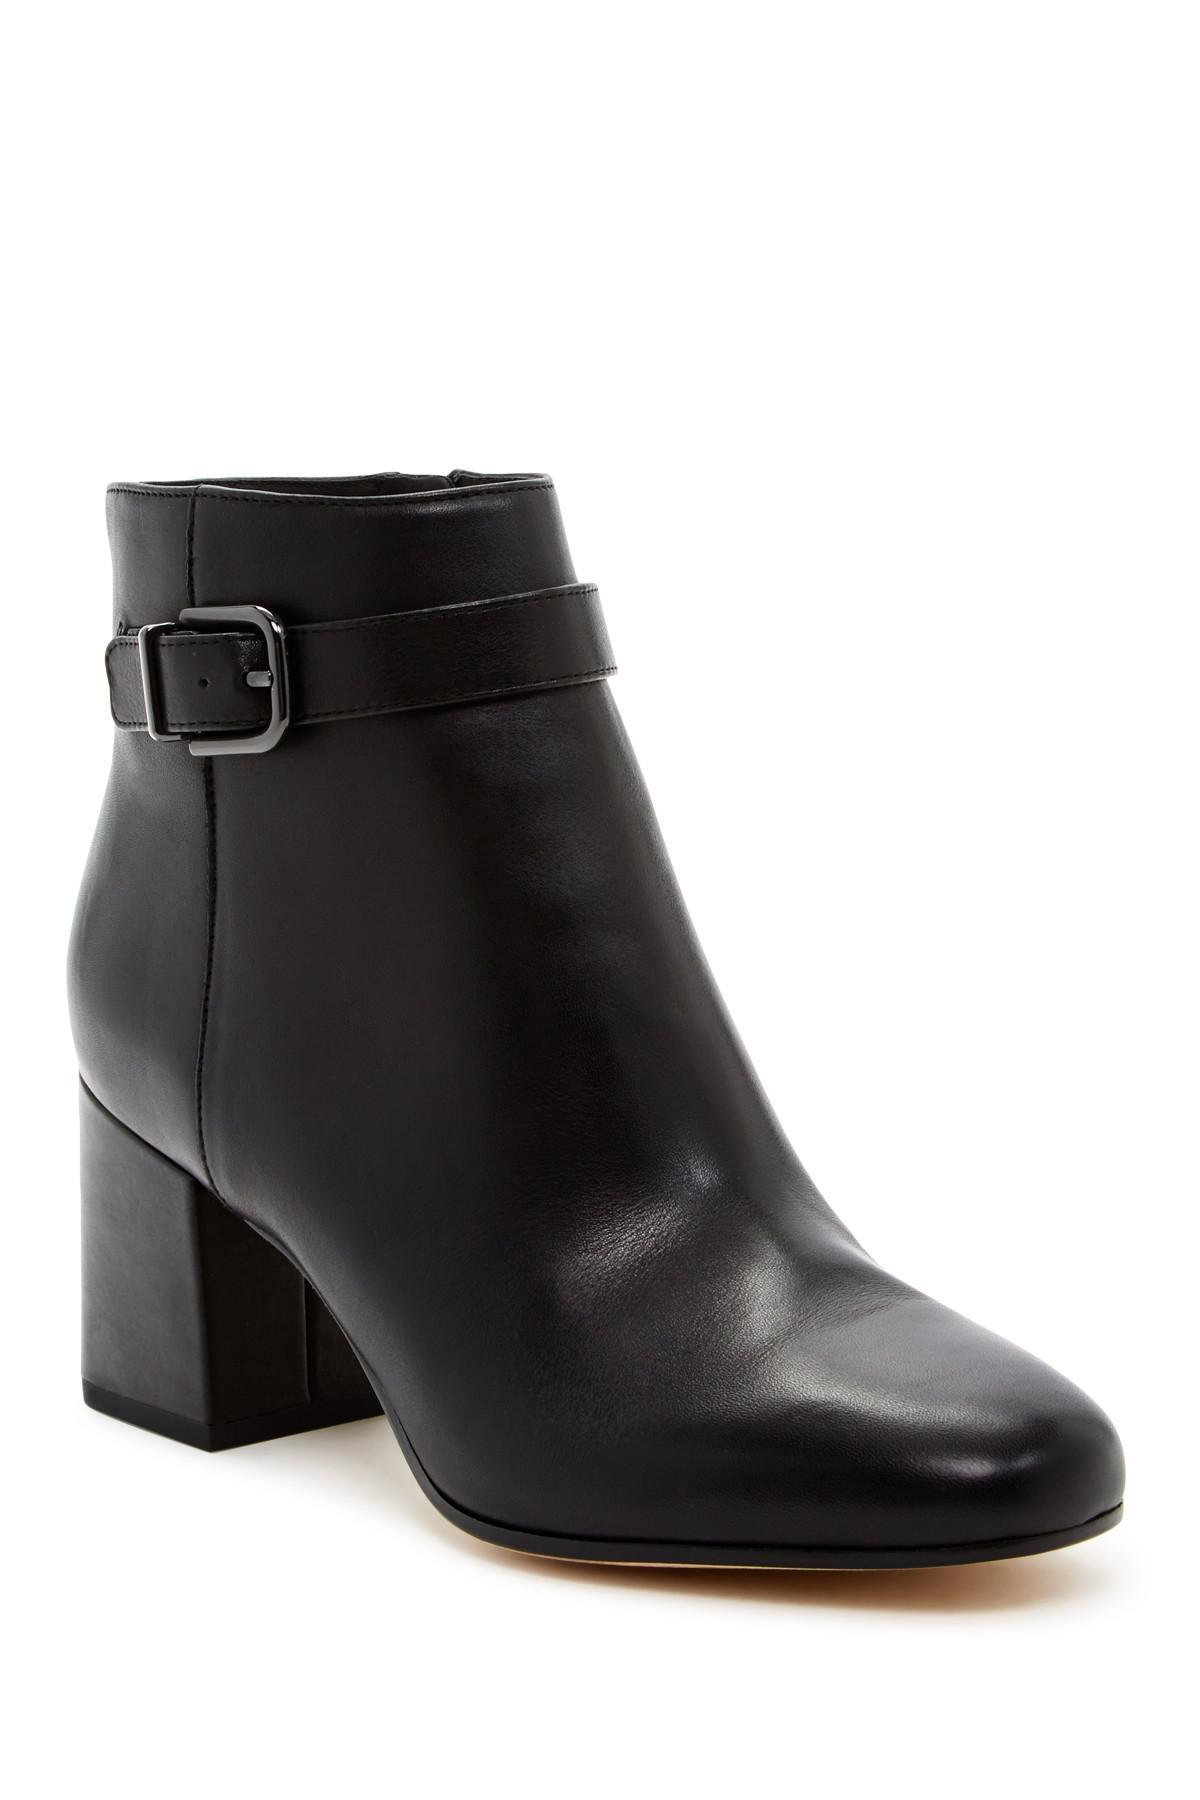 ada0821b3057 Lyst - Via Spiga Maxine Ankle Strap Bootie in Black